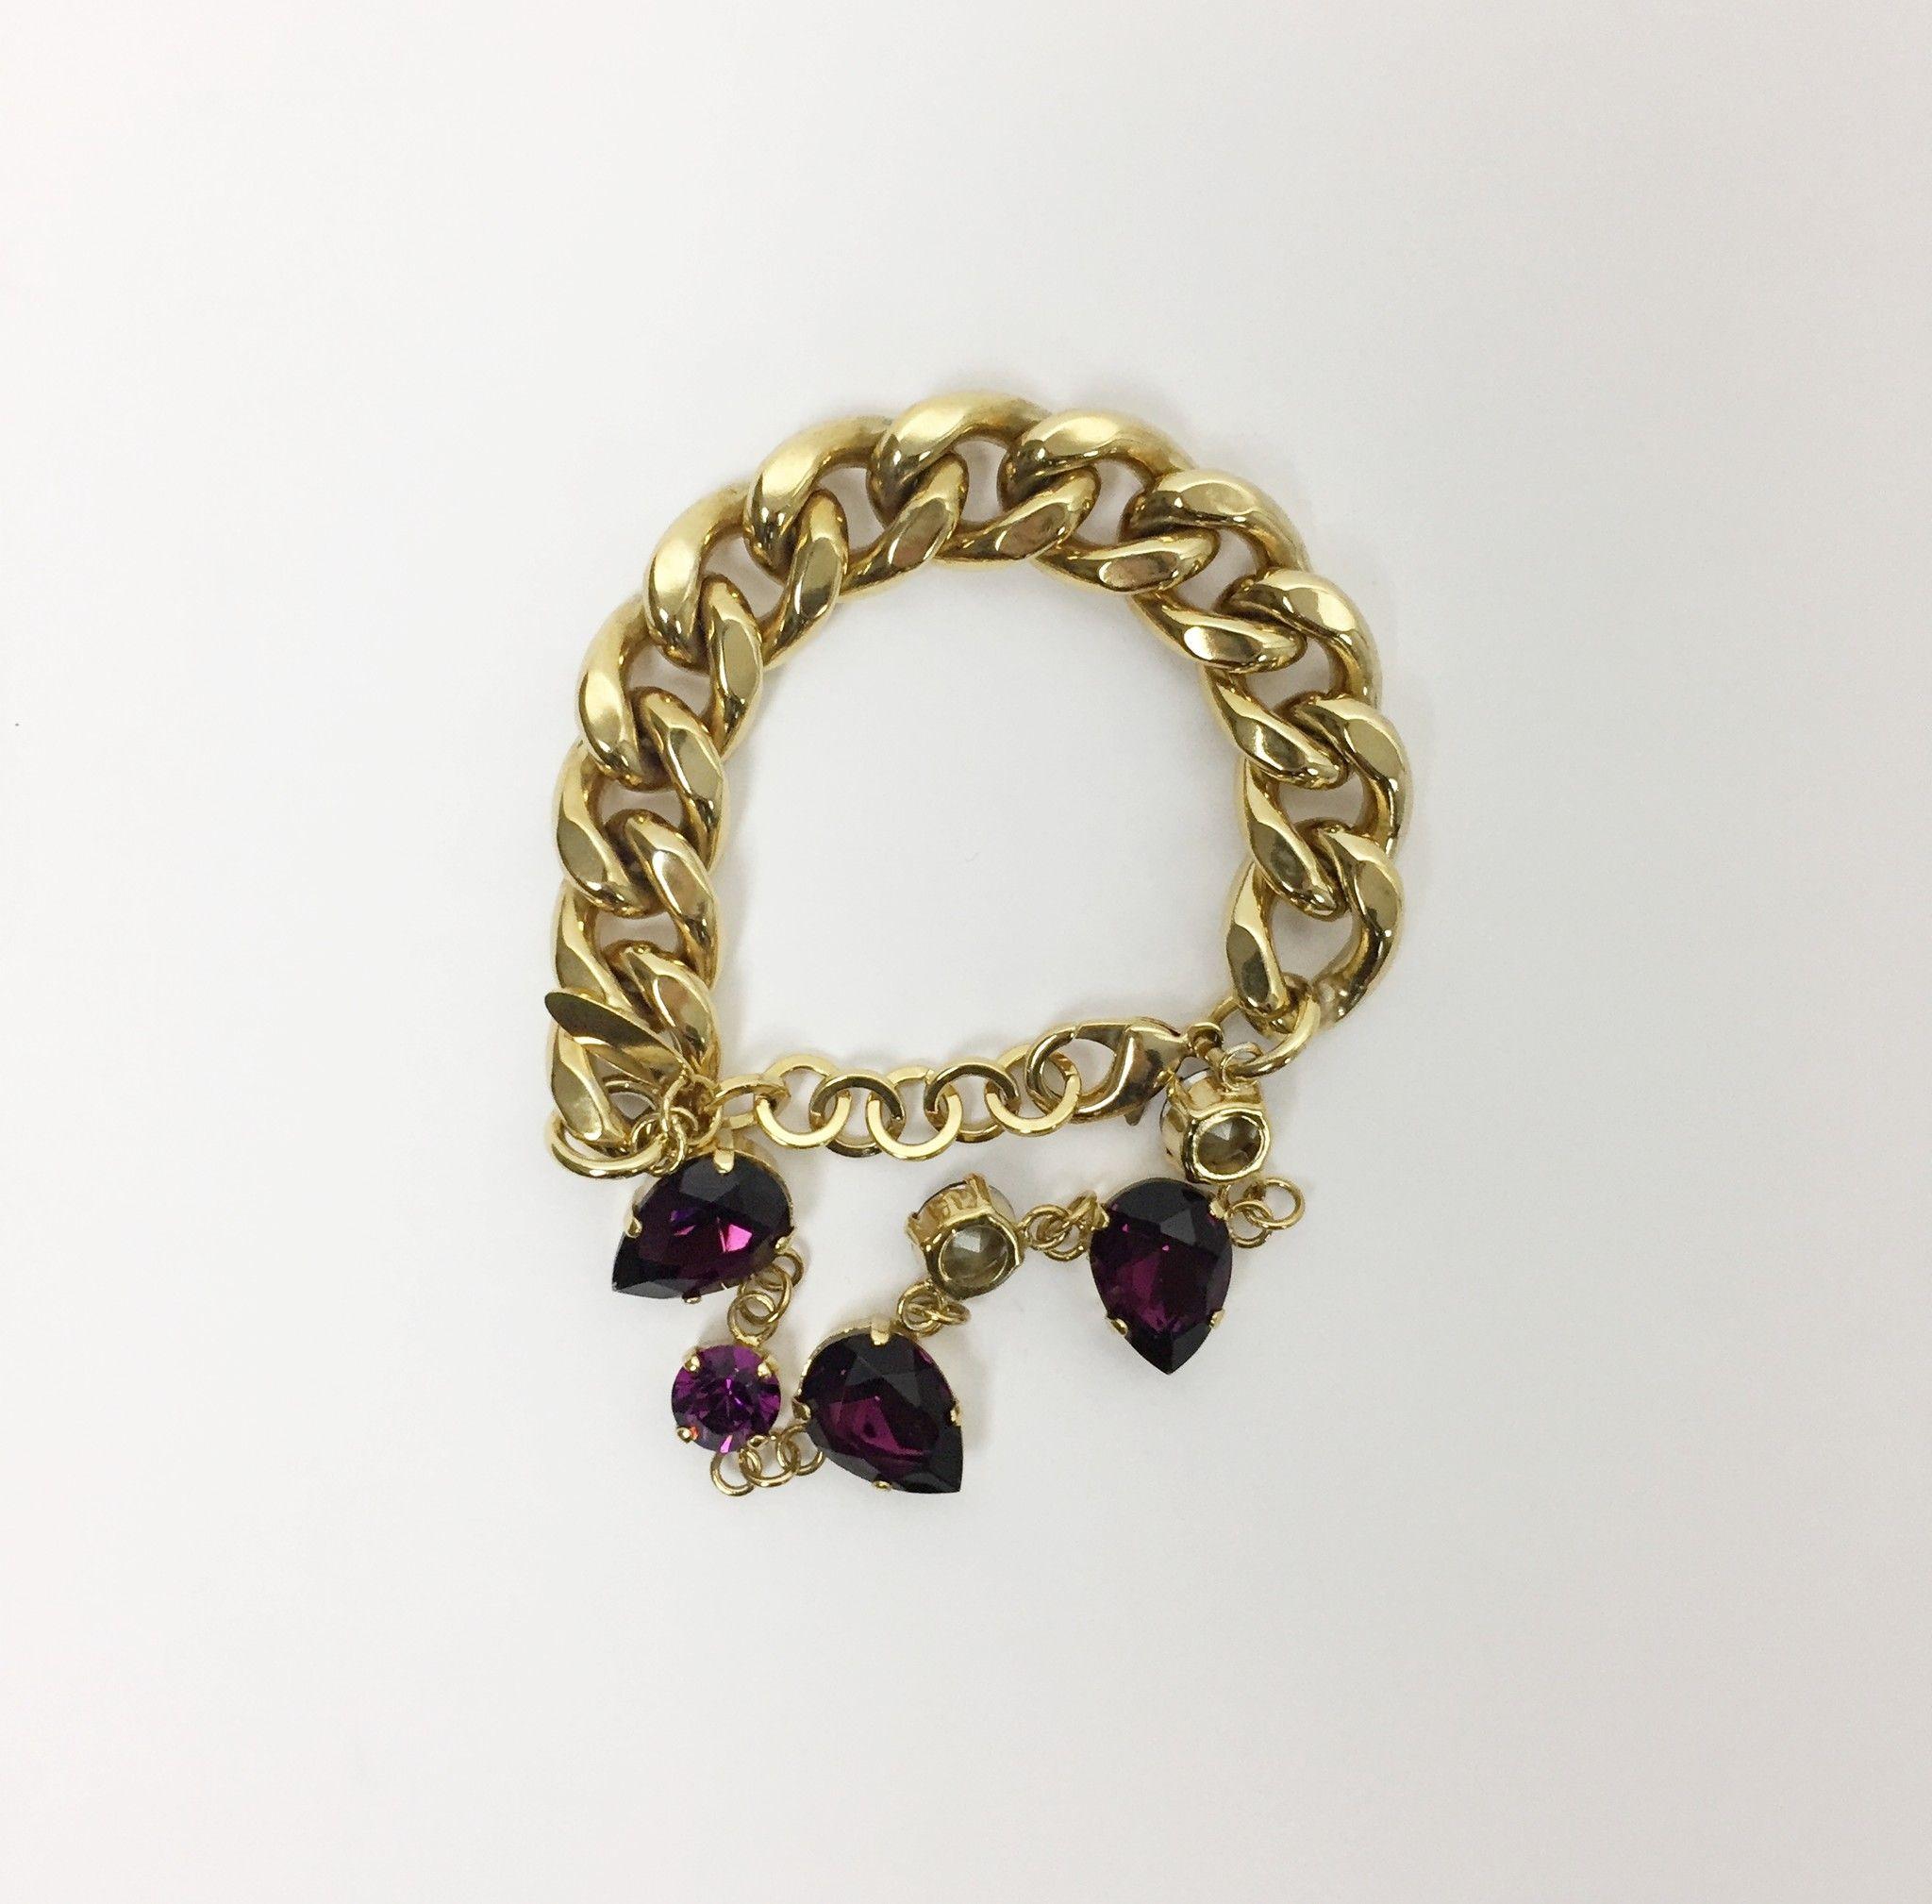 Atos Lombardini Gold Chain Bracelet with Stones Cod.348251